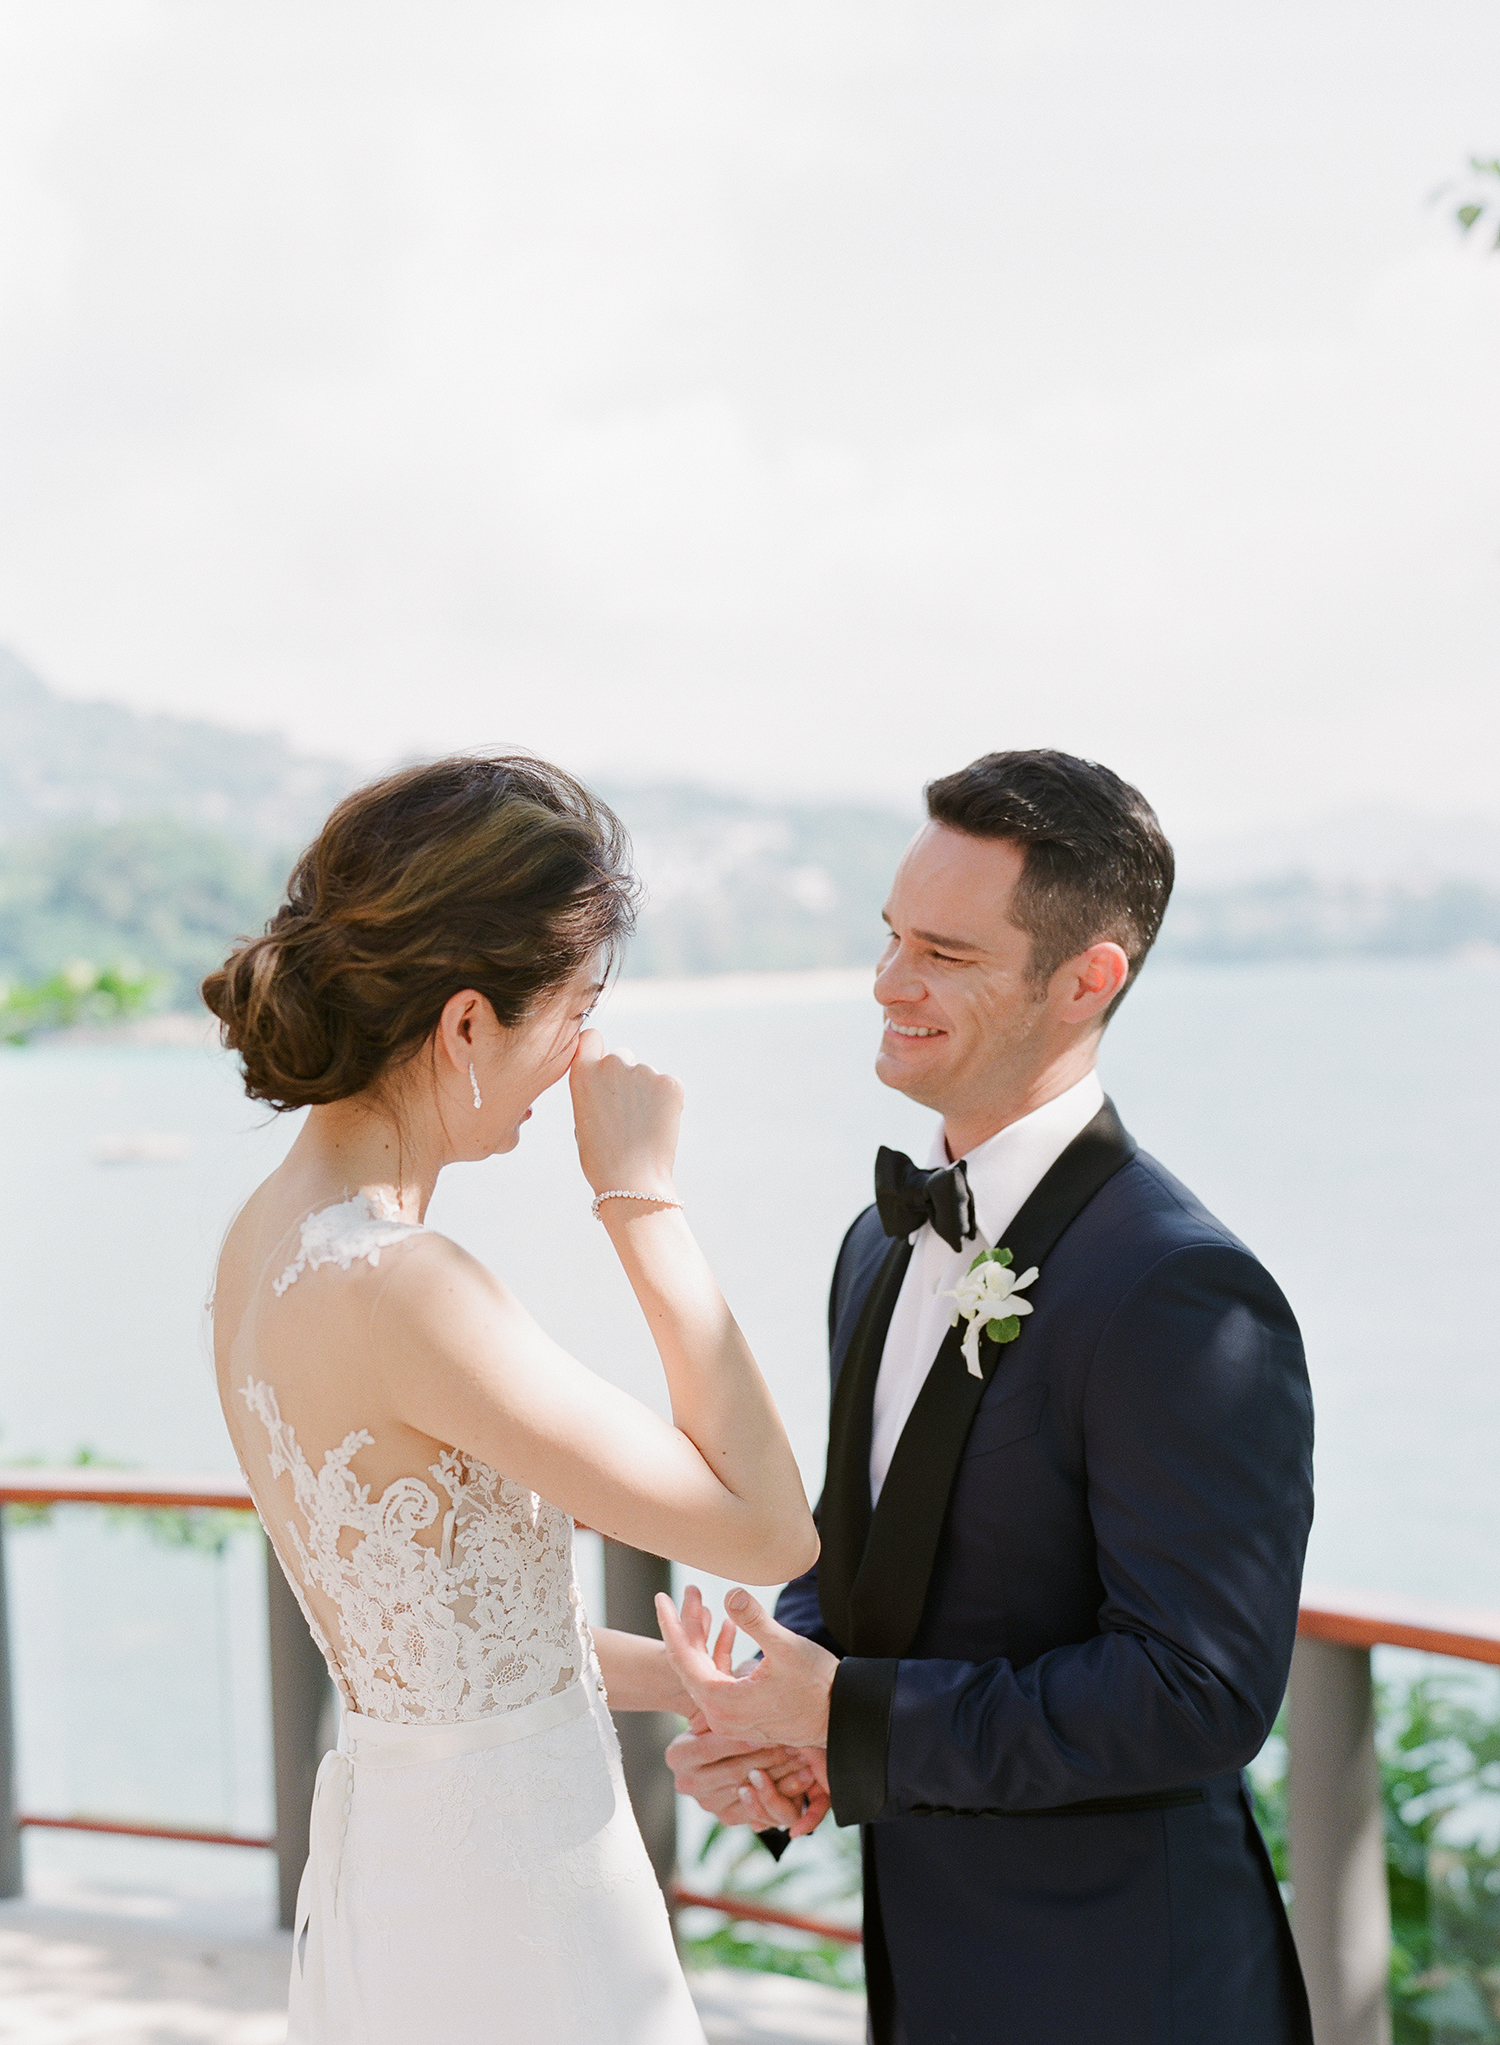 stacy brad wedding thailand first look